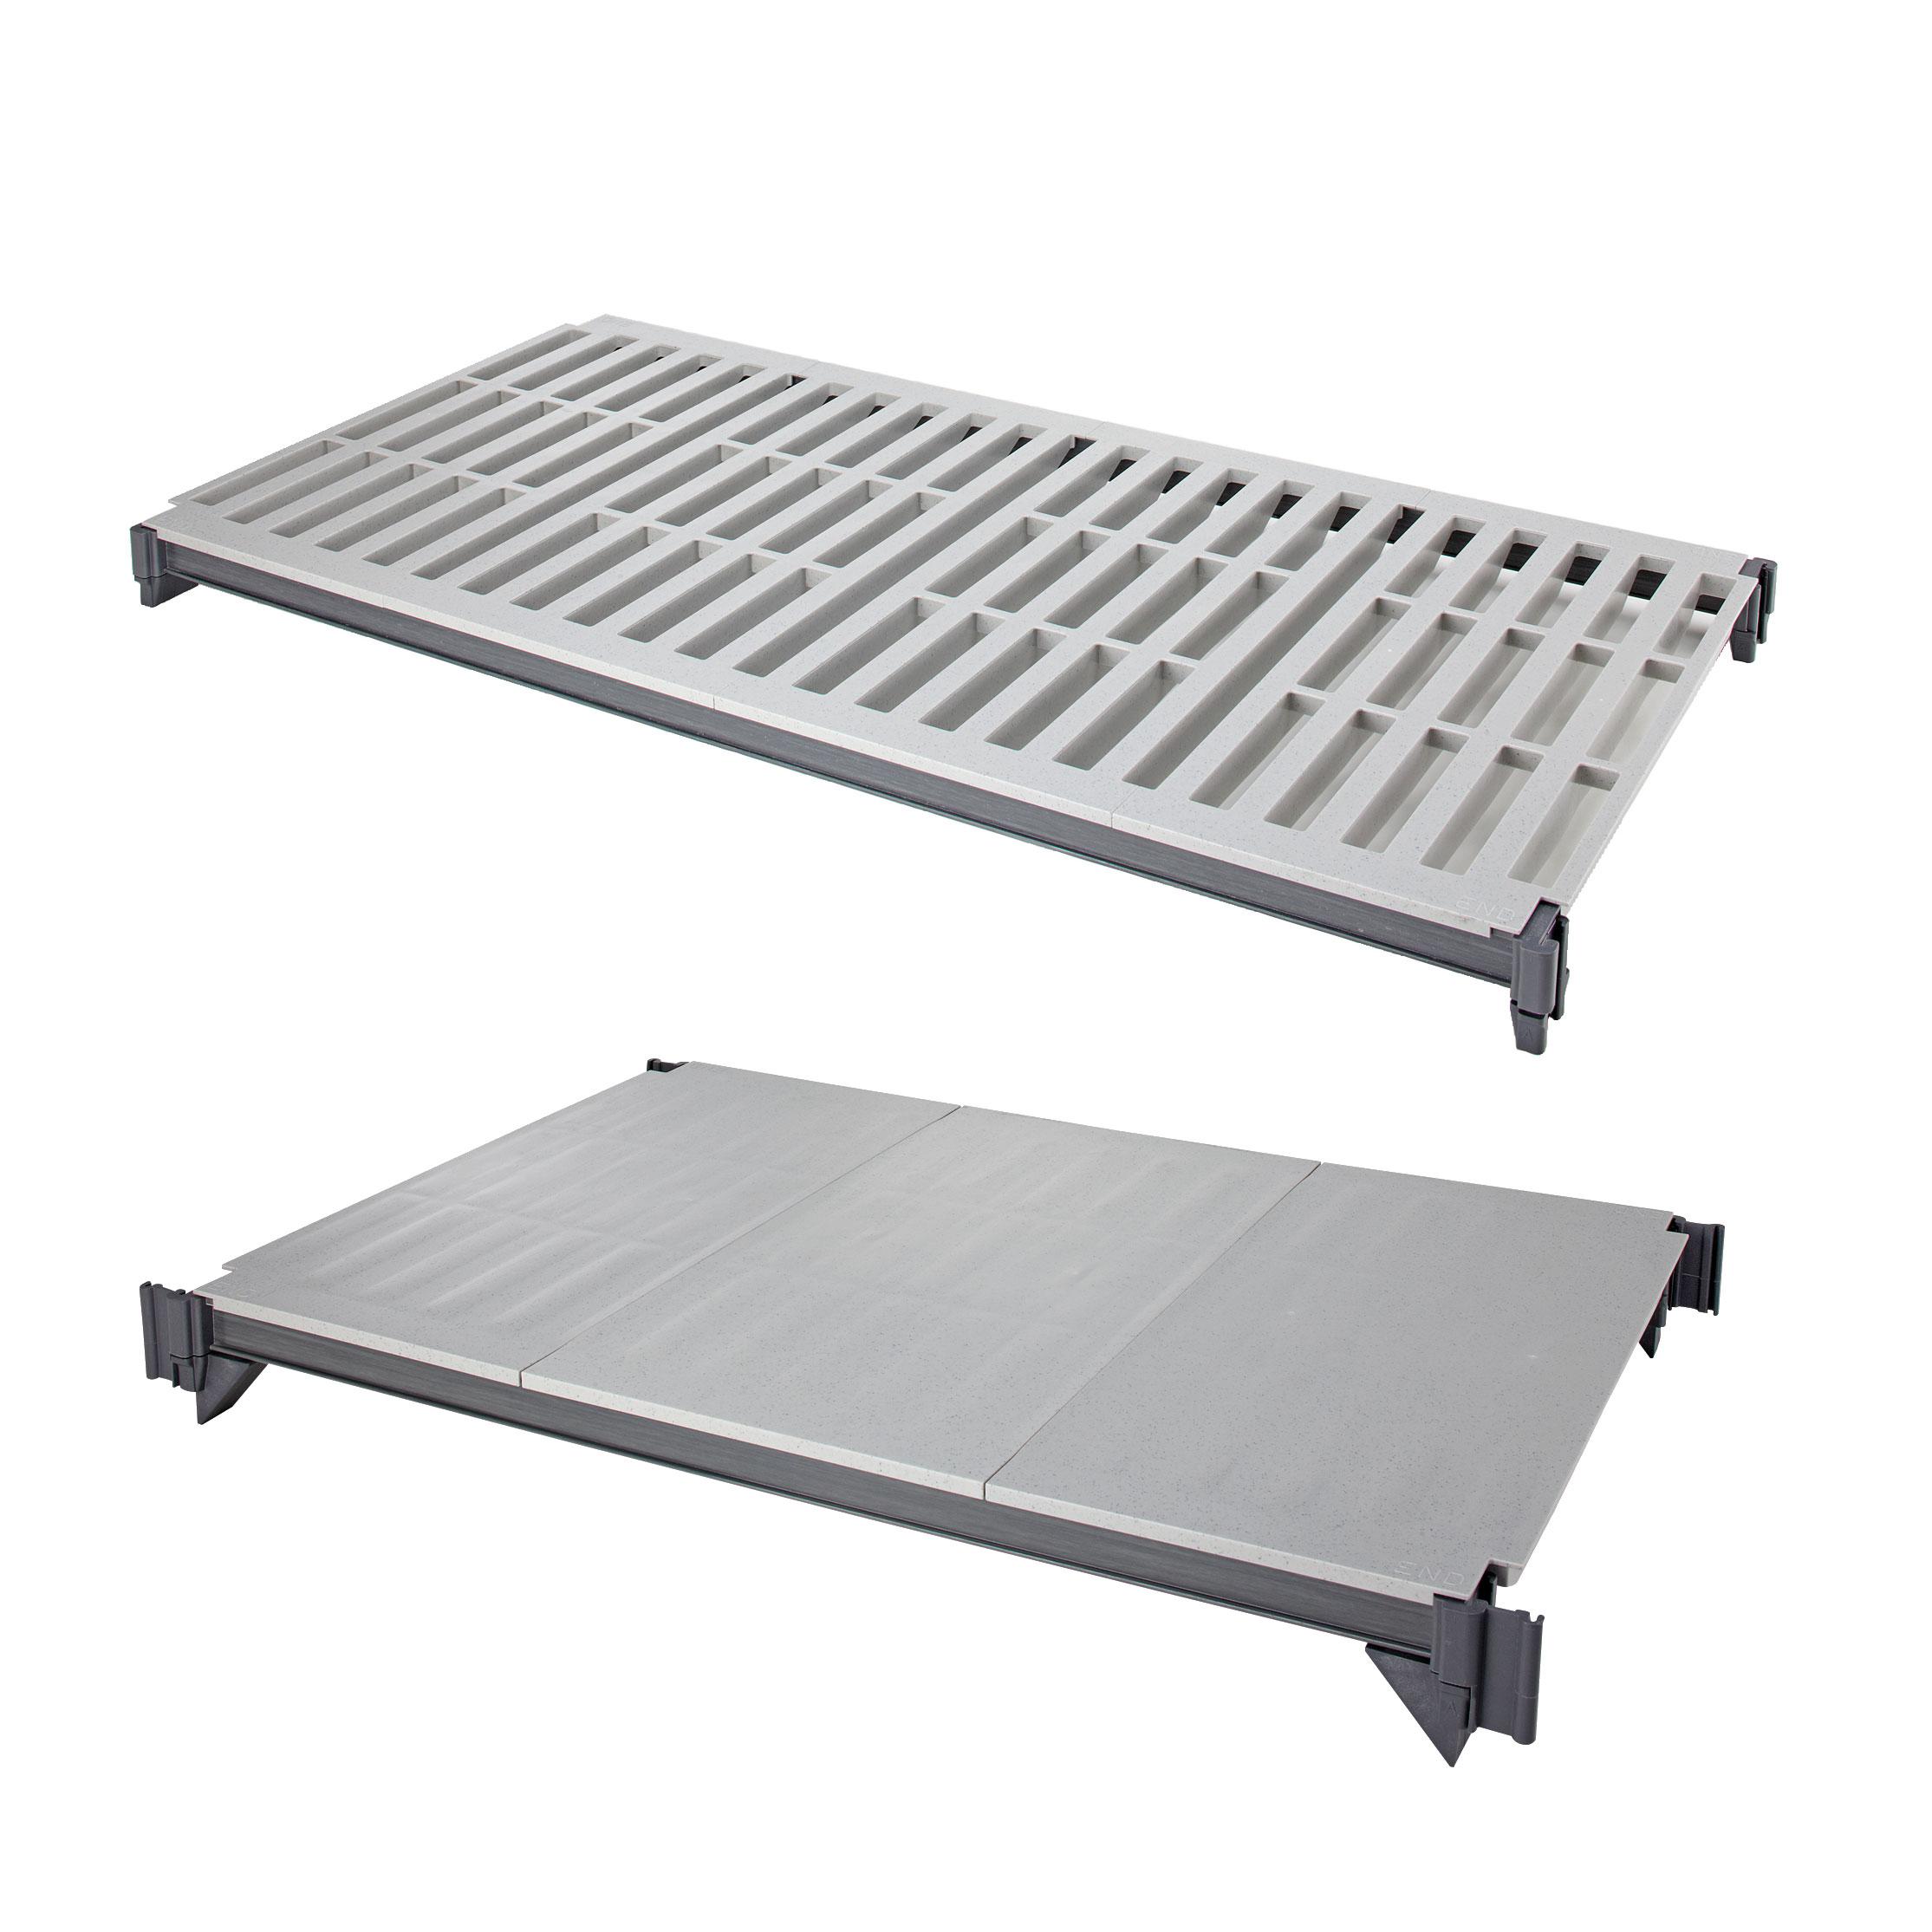 Cambro ESK2136VS5580 shelving/shelving systems